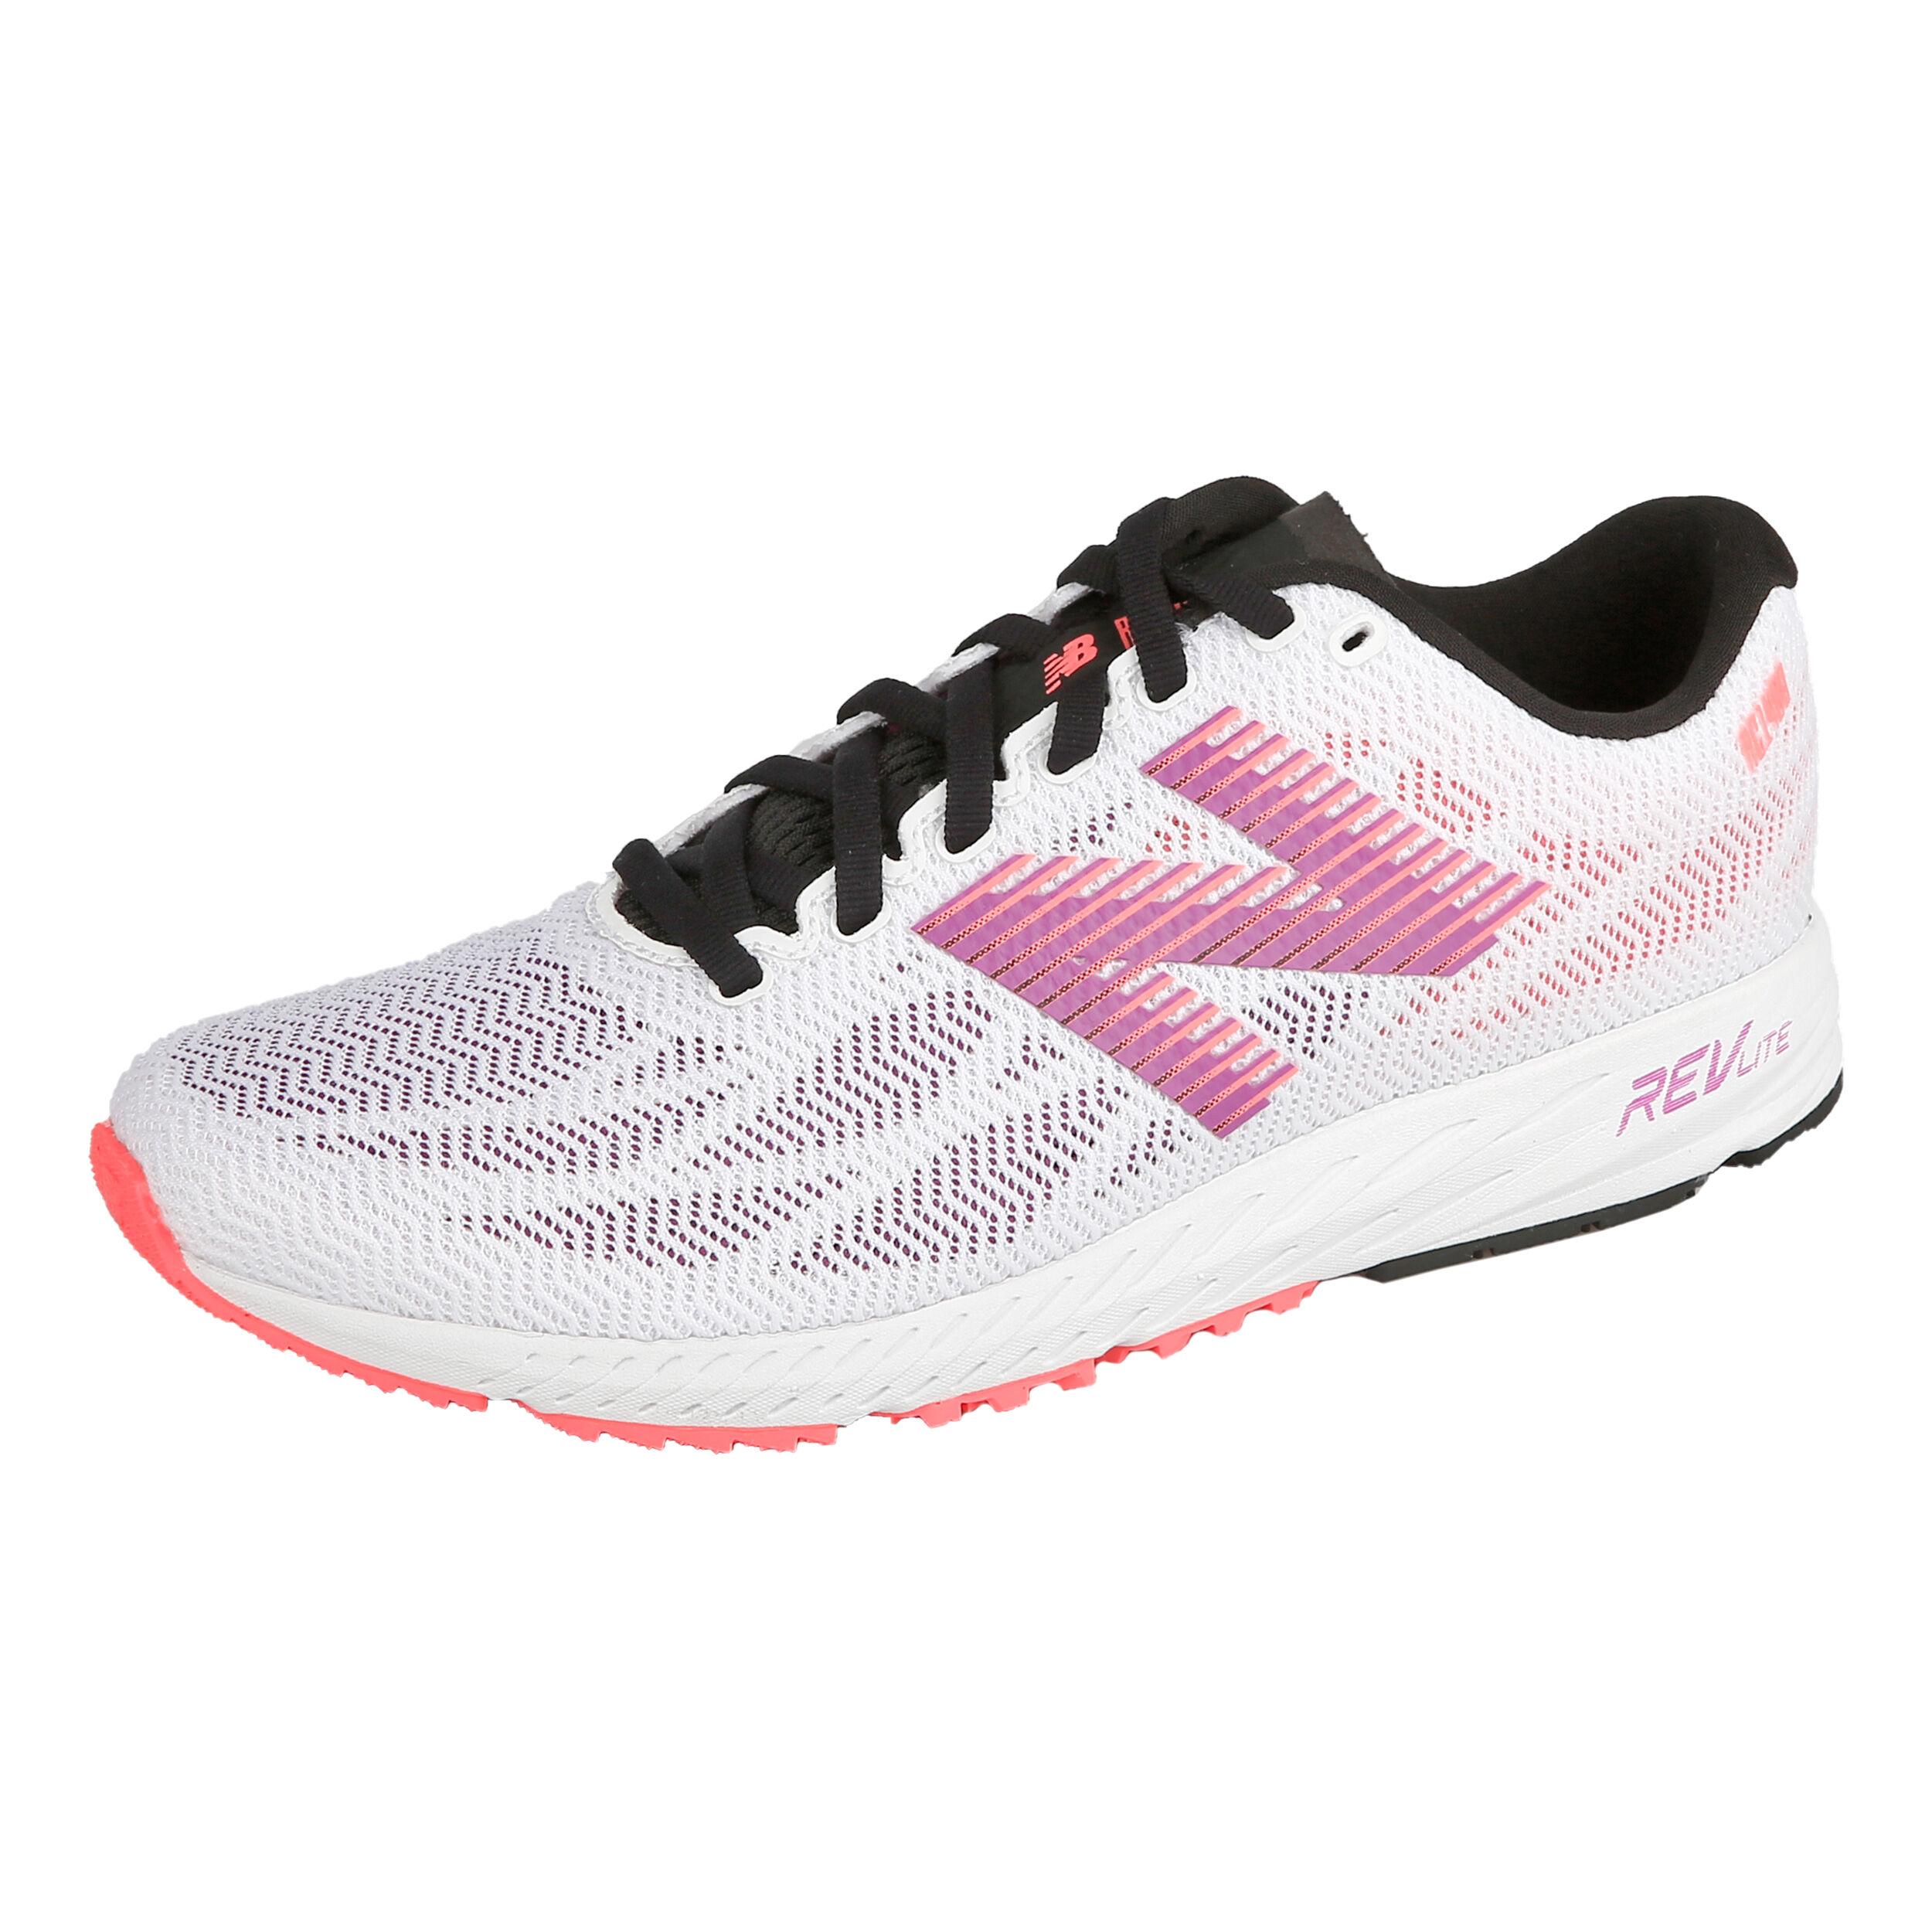 buy New Balance 1400 V6 Competition Running Shoe Women ...